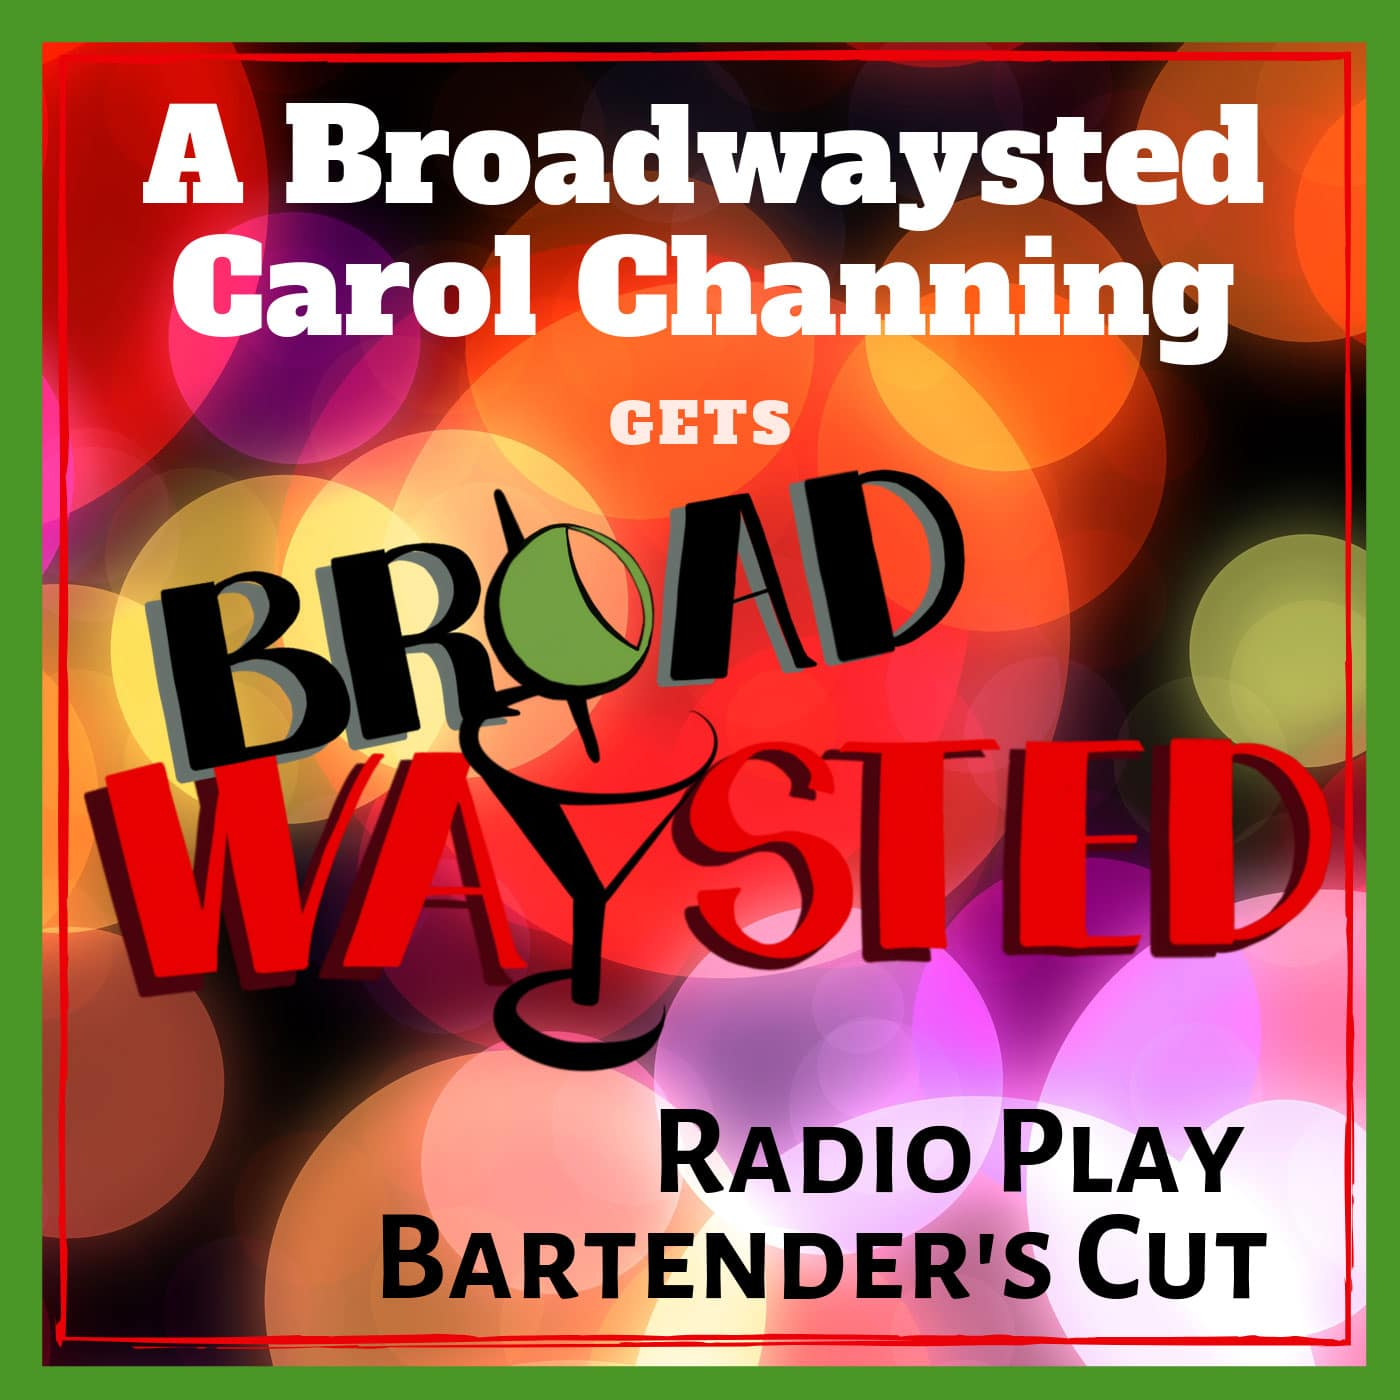 A-Broadwaysted-Carol-Channing-Bartender's-Cut